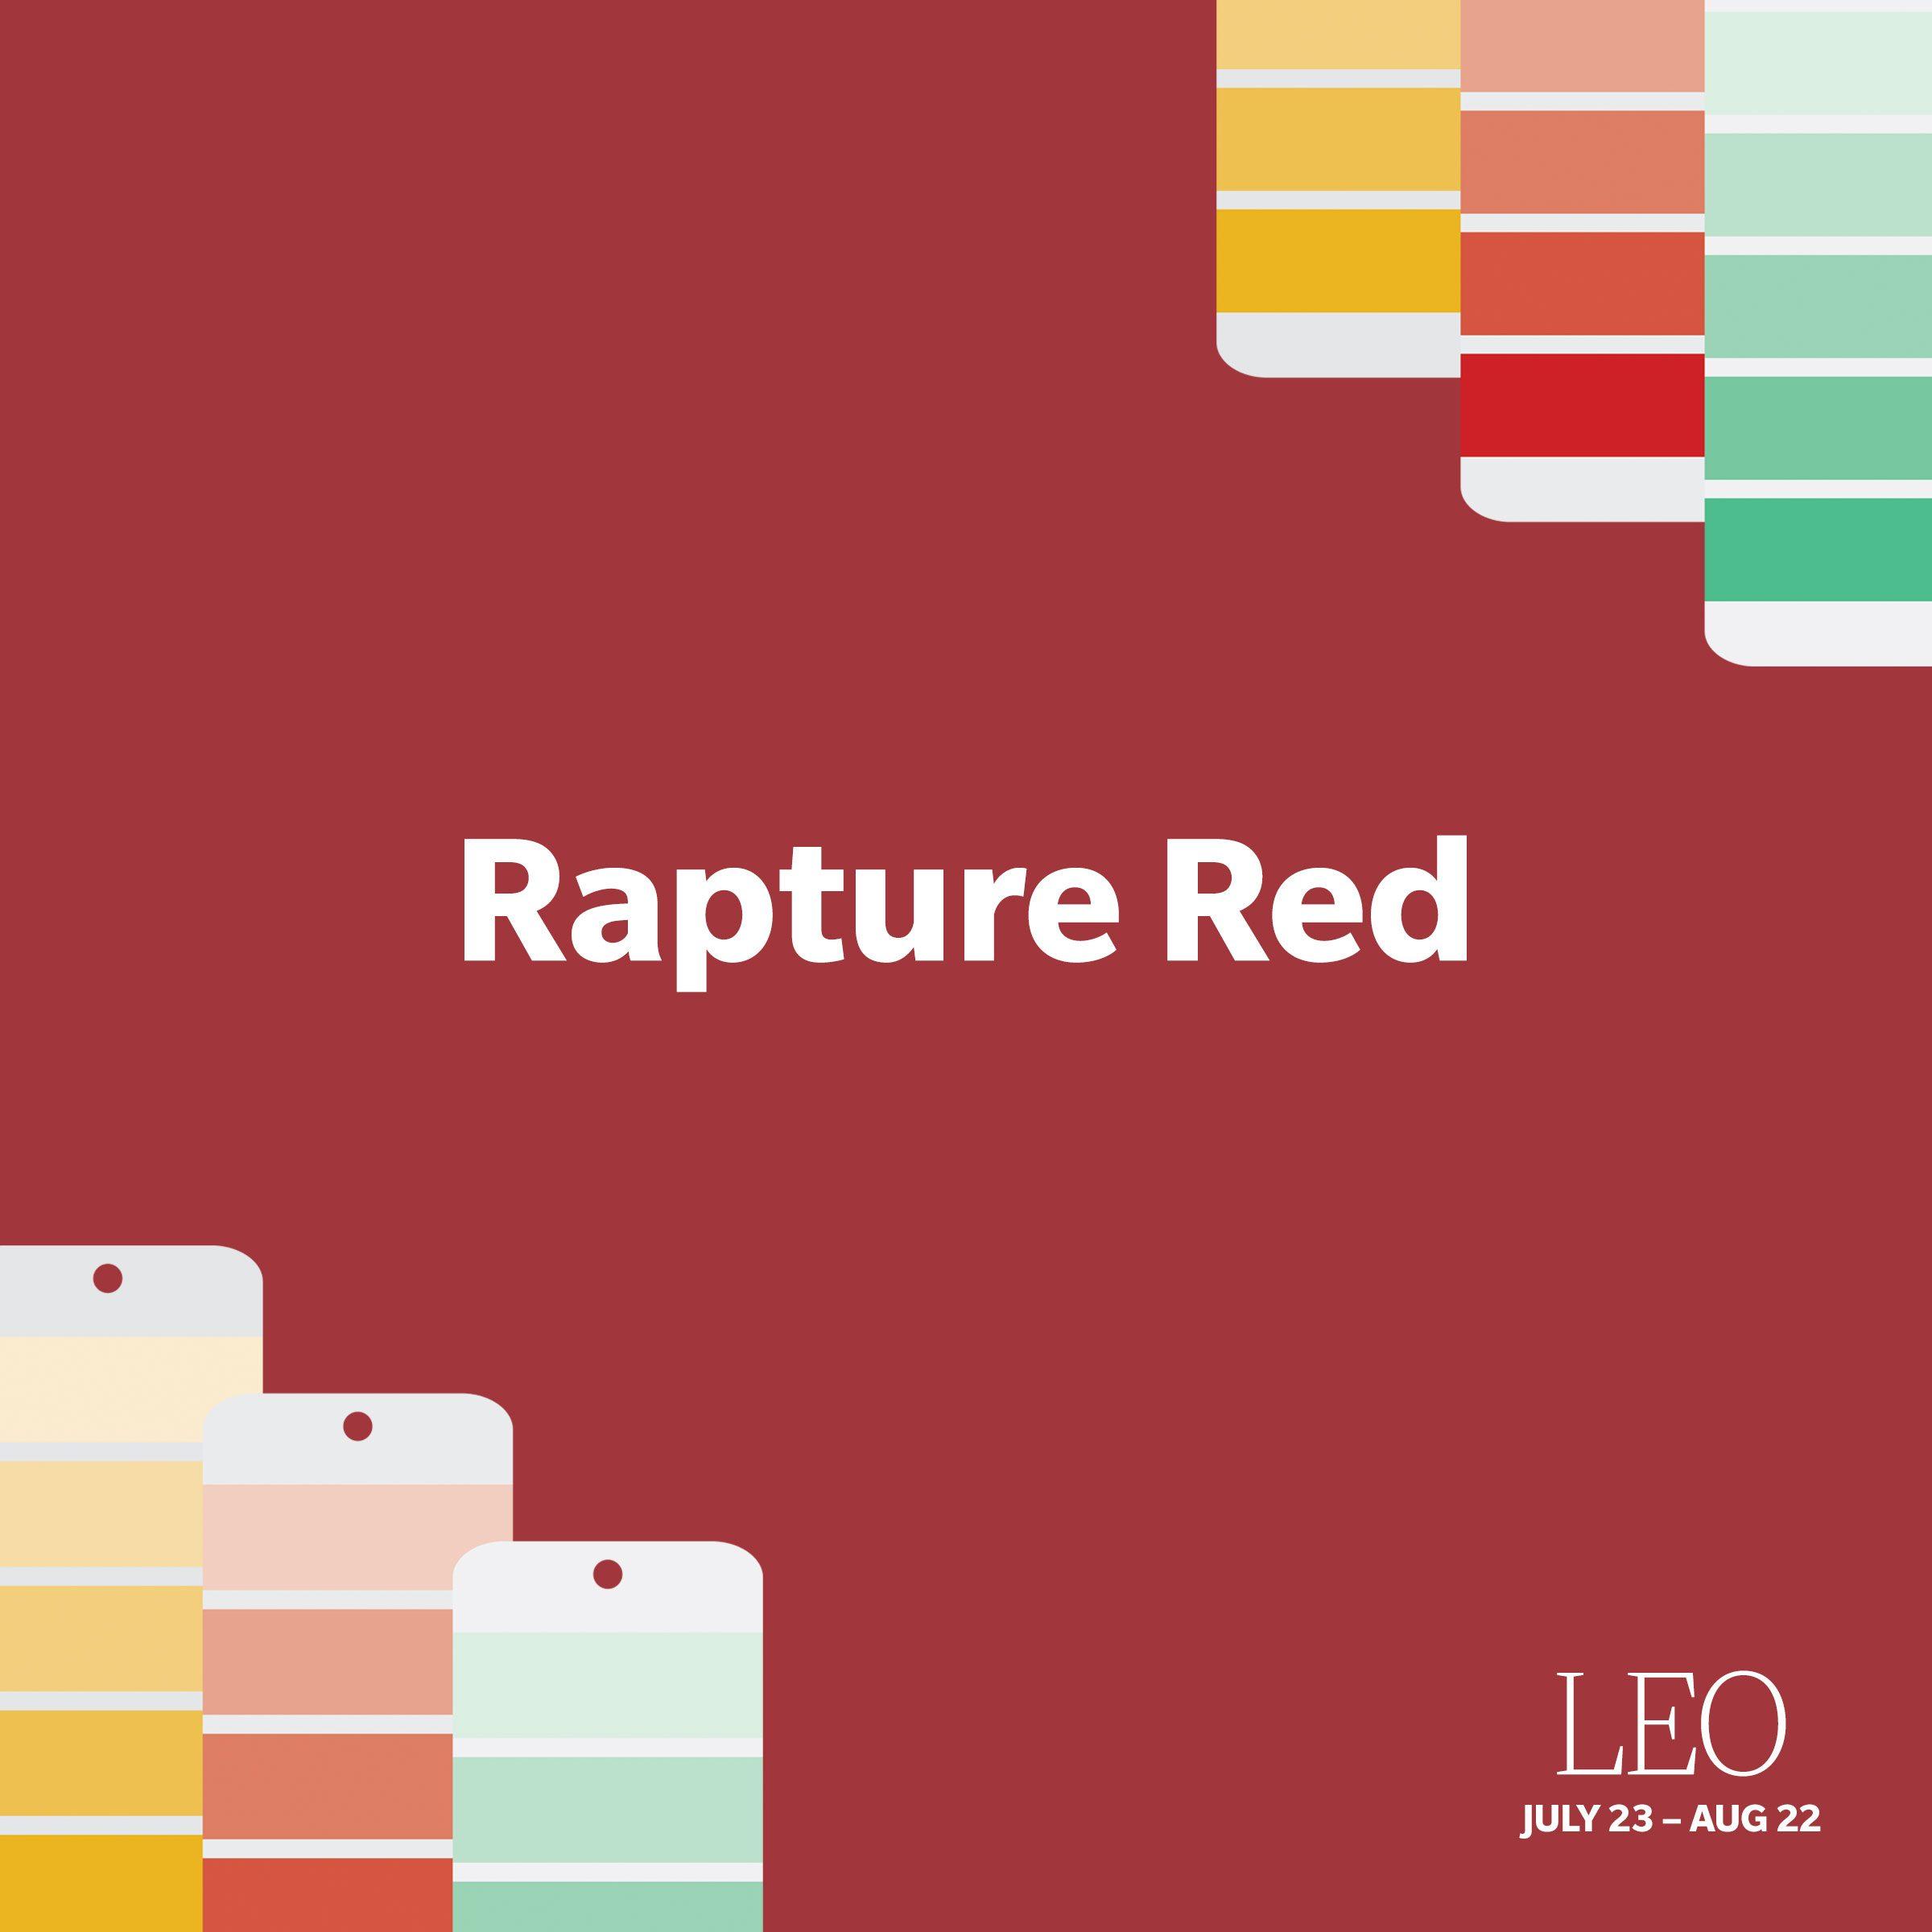 Leo: Rapture Red